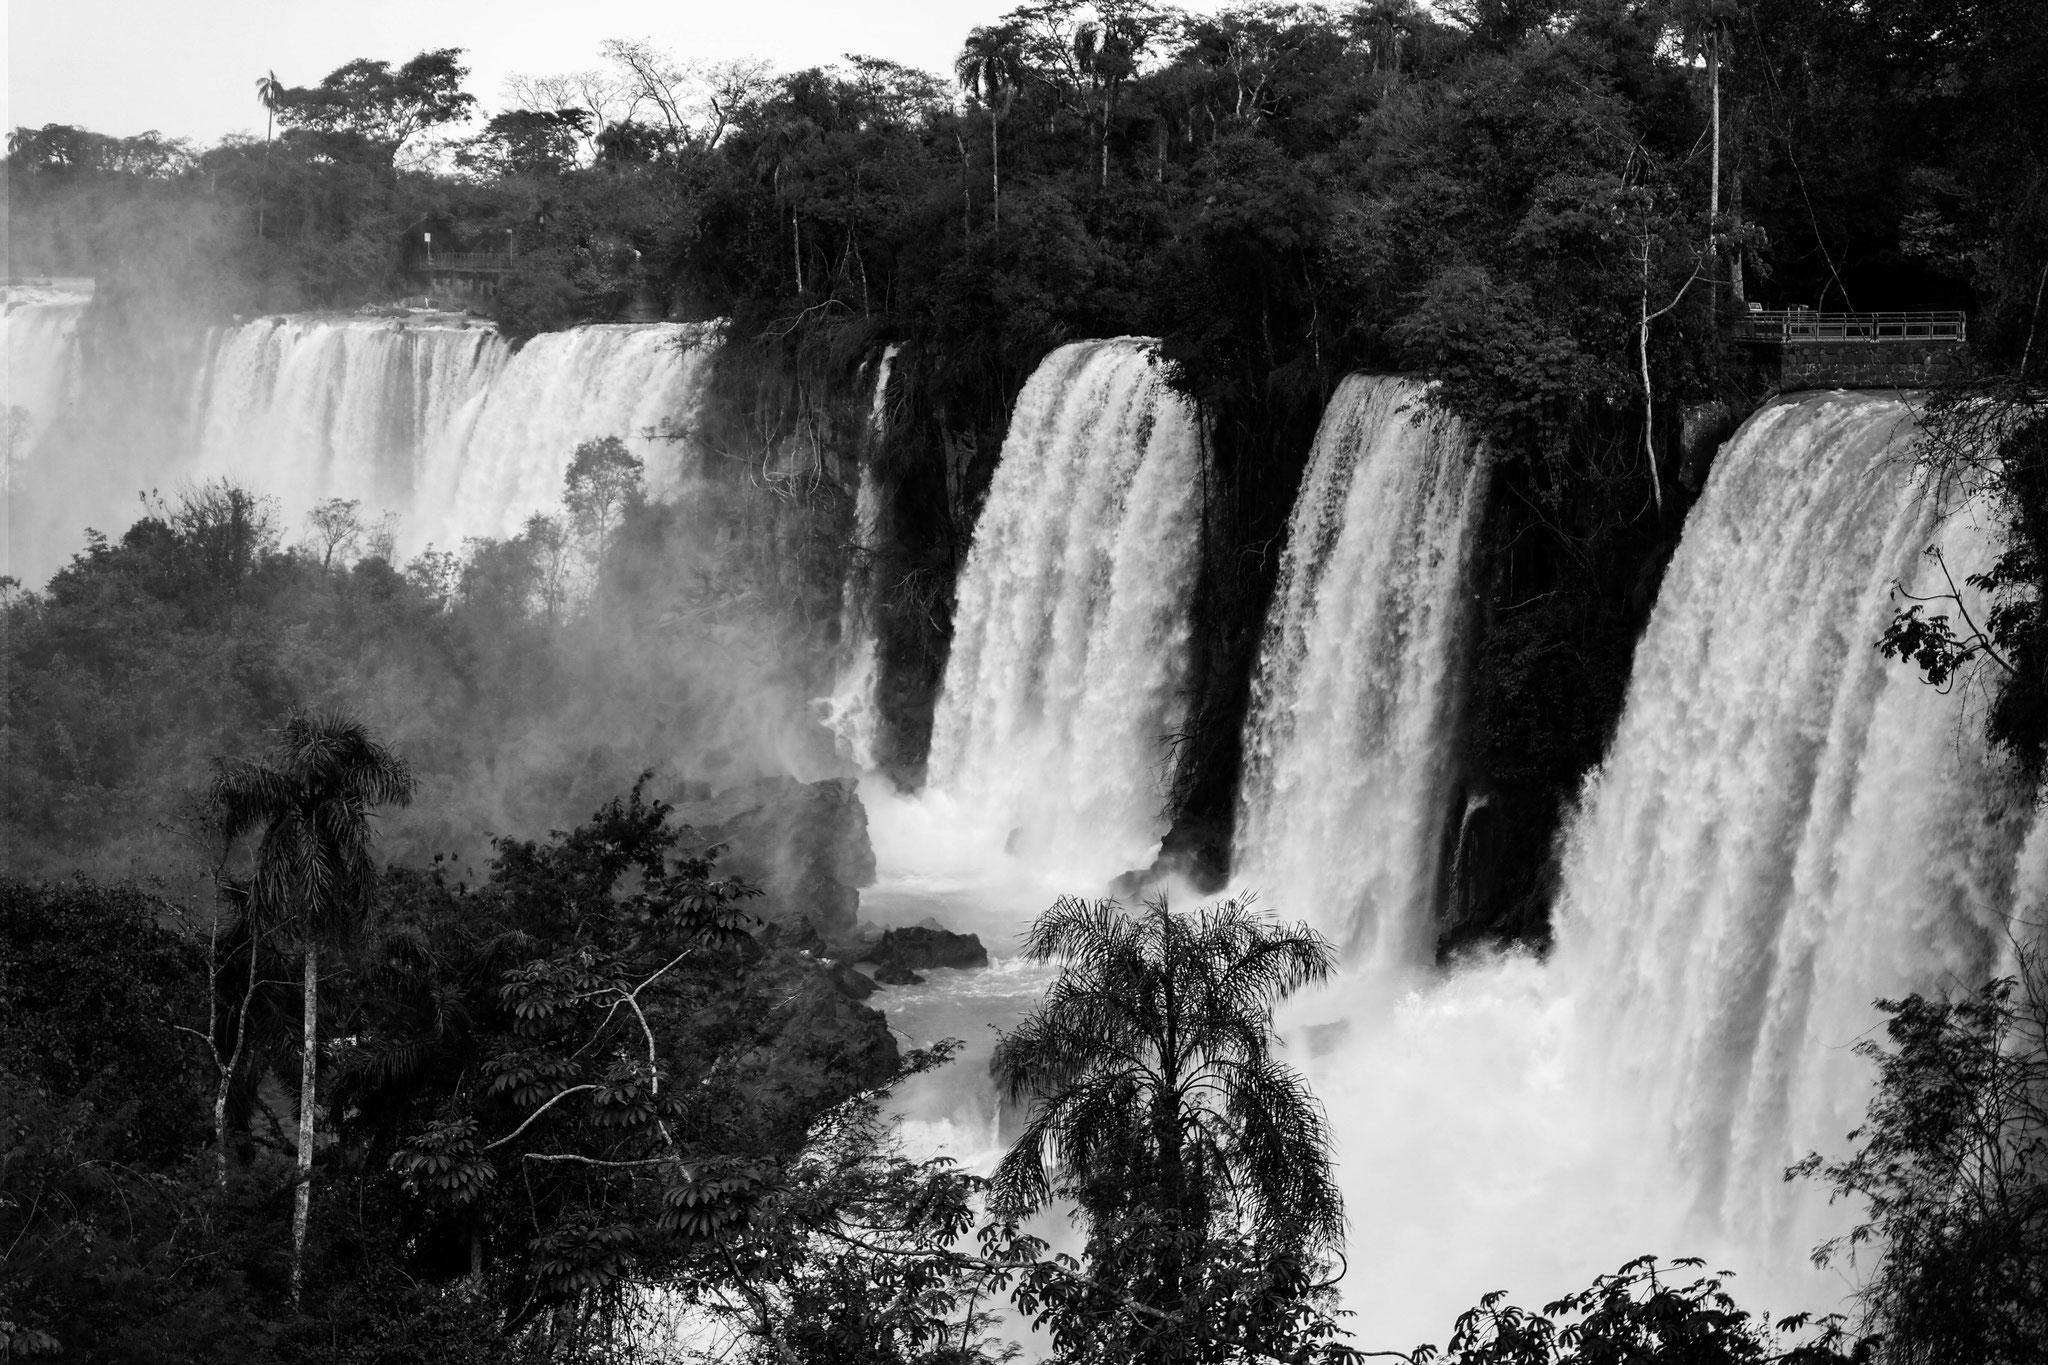 Smaller waterfalls in Iguazú, Argentinian side.